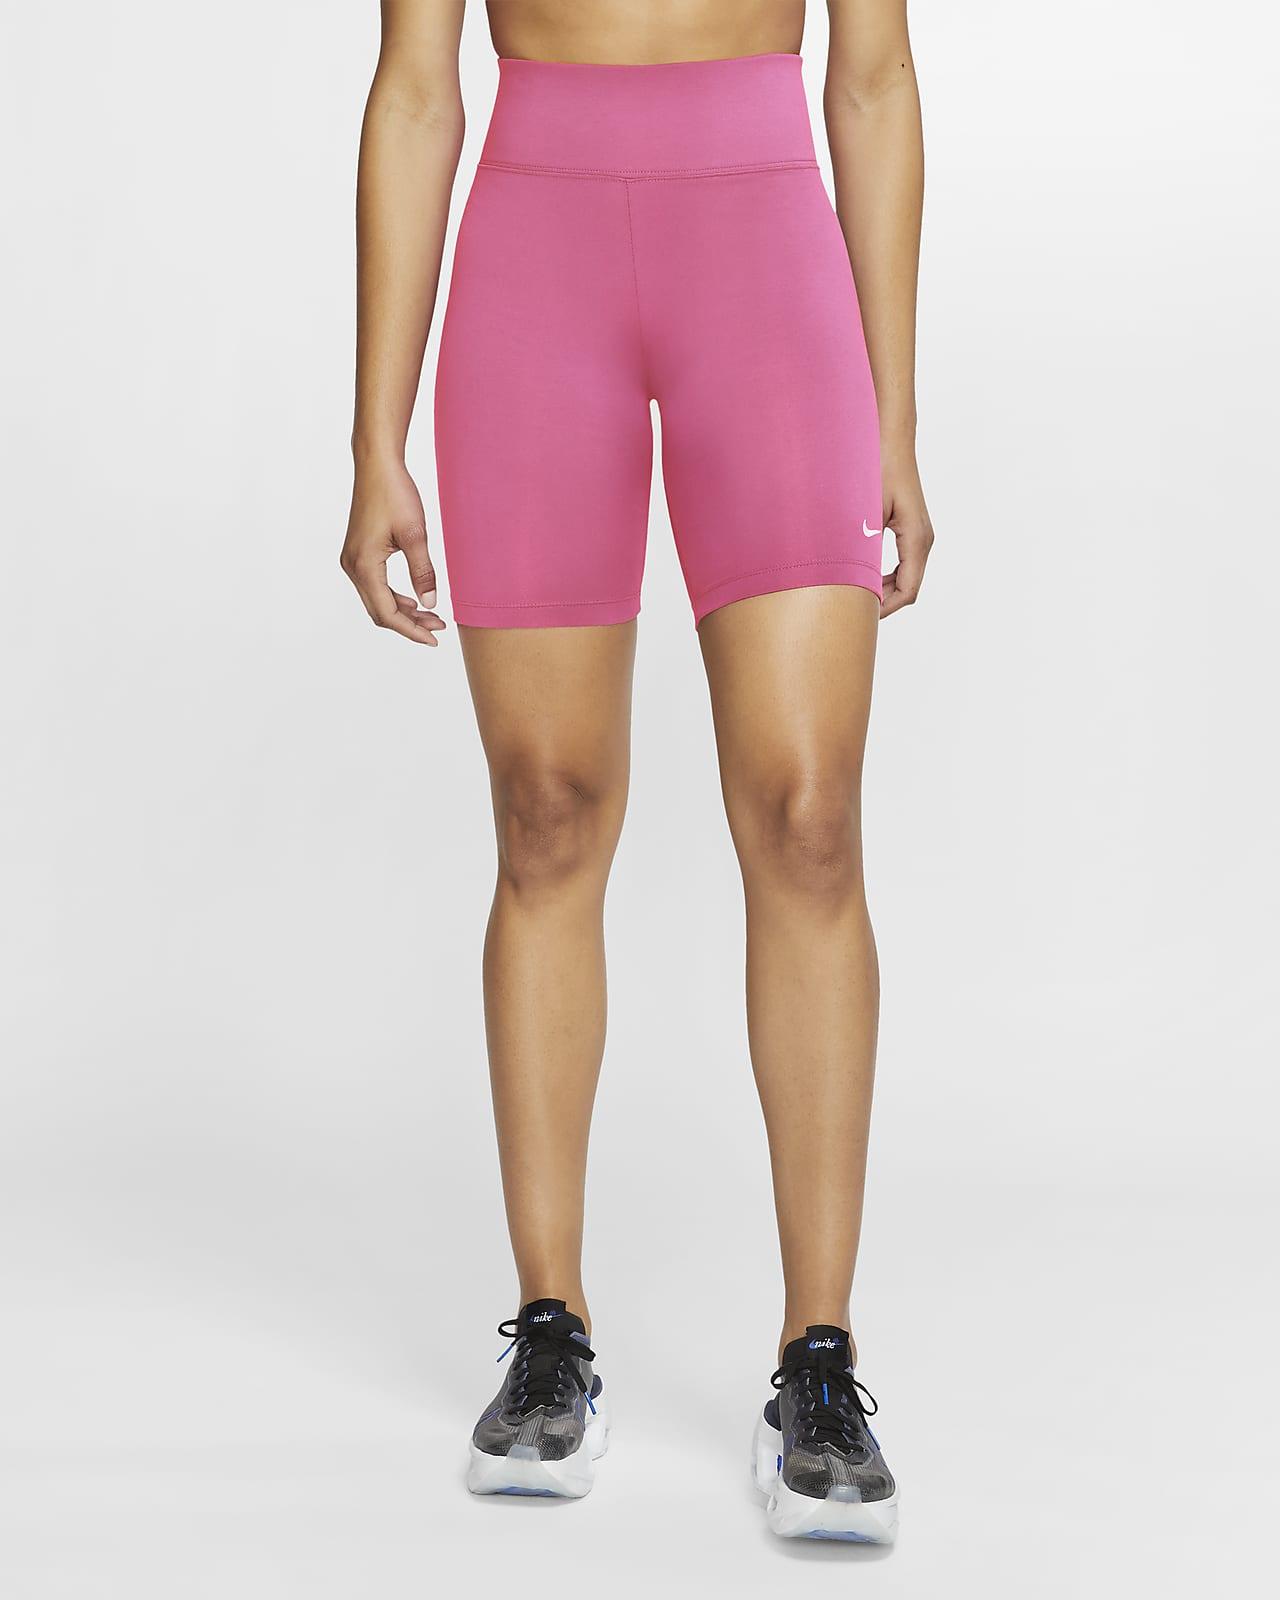 Calções tipo ciclista Nike Sportswear Leg-A-See para mulher